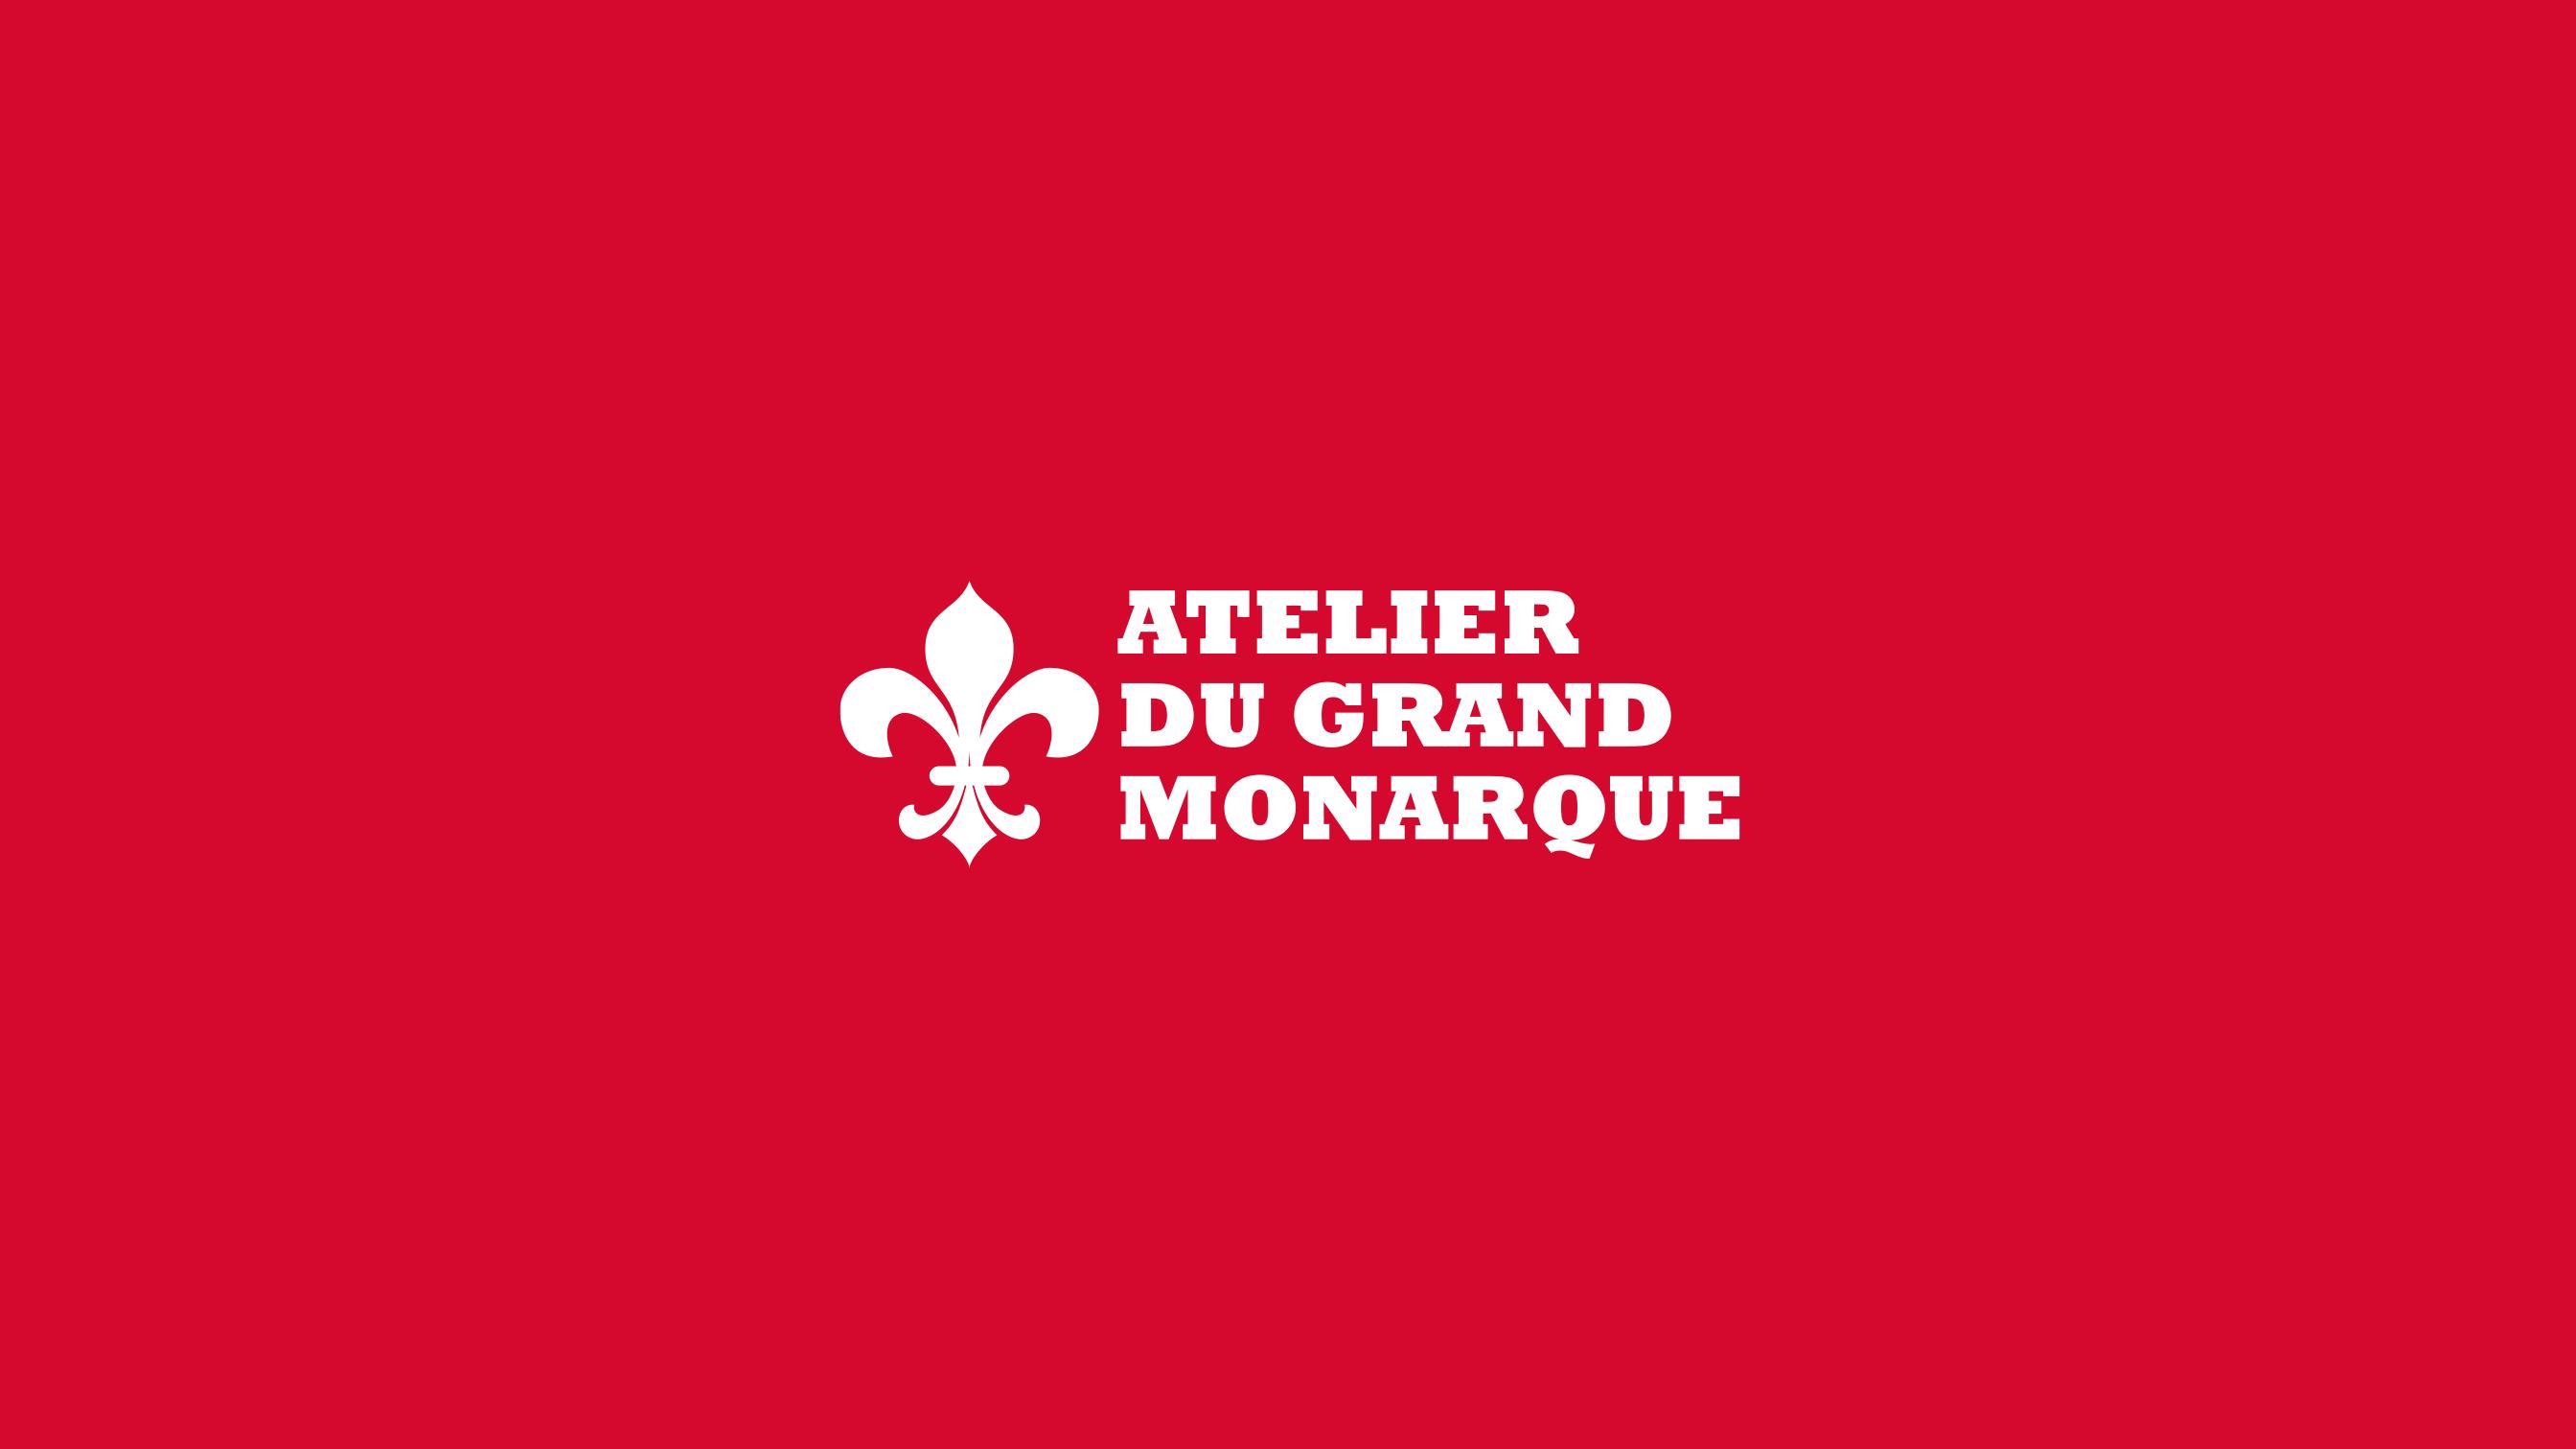 atelierdugrandmonarque-logotype-pikteo